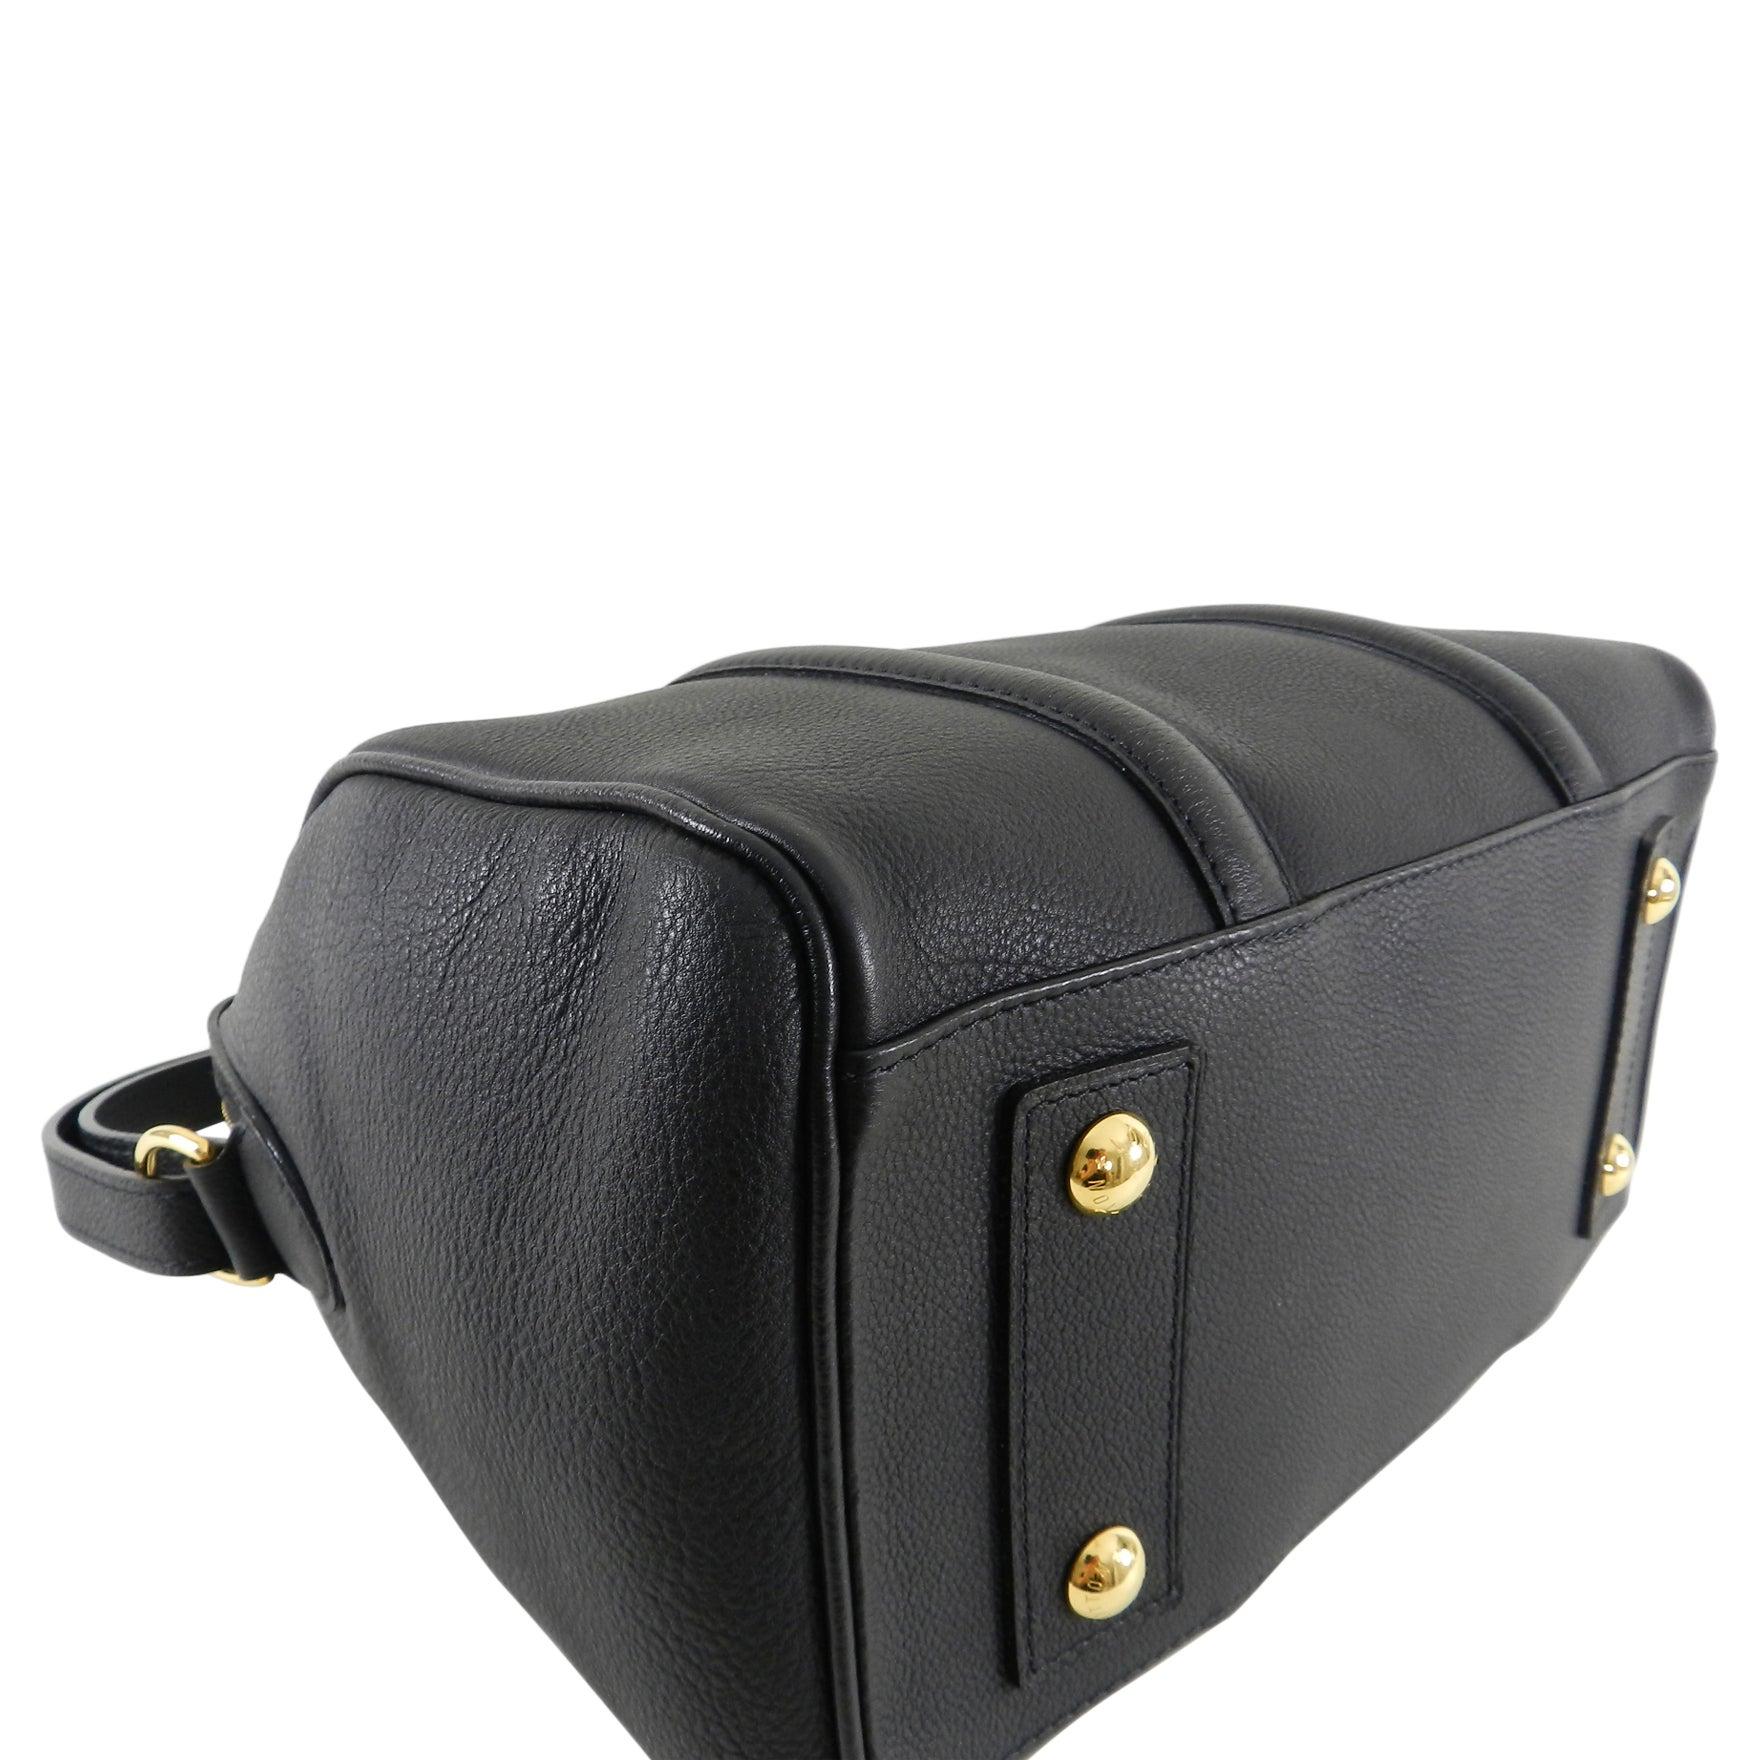 80c8a45113ab Louis Vuitton Black MM Sofia Coppola Boston Bag at 1stdibs